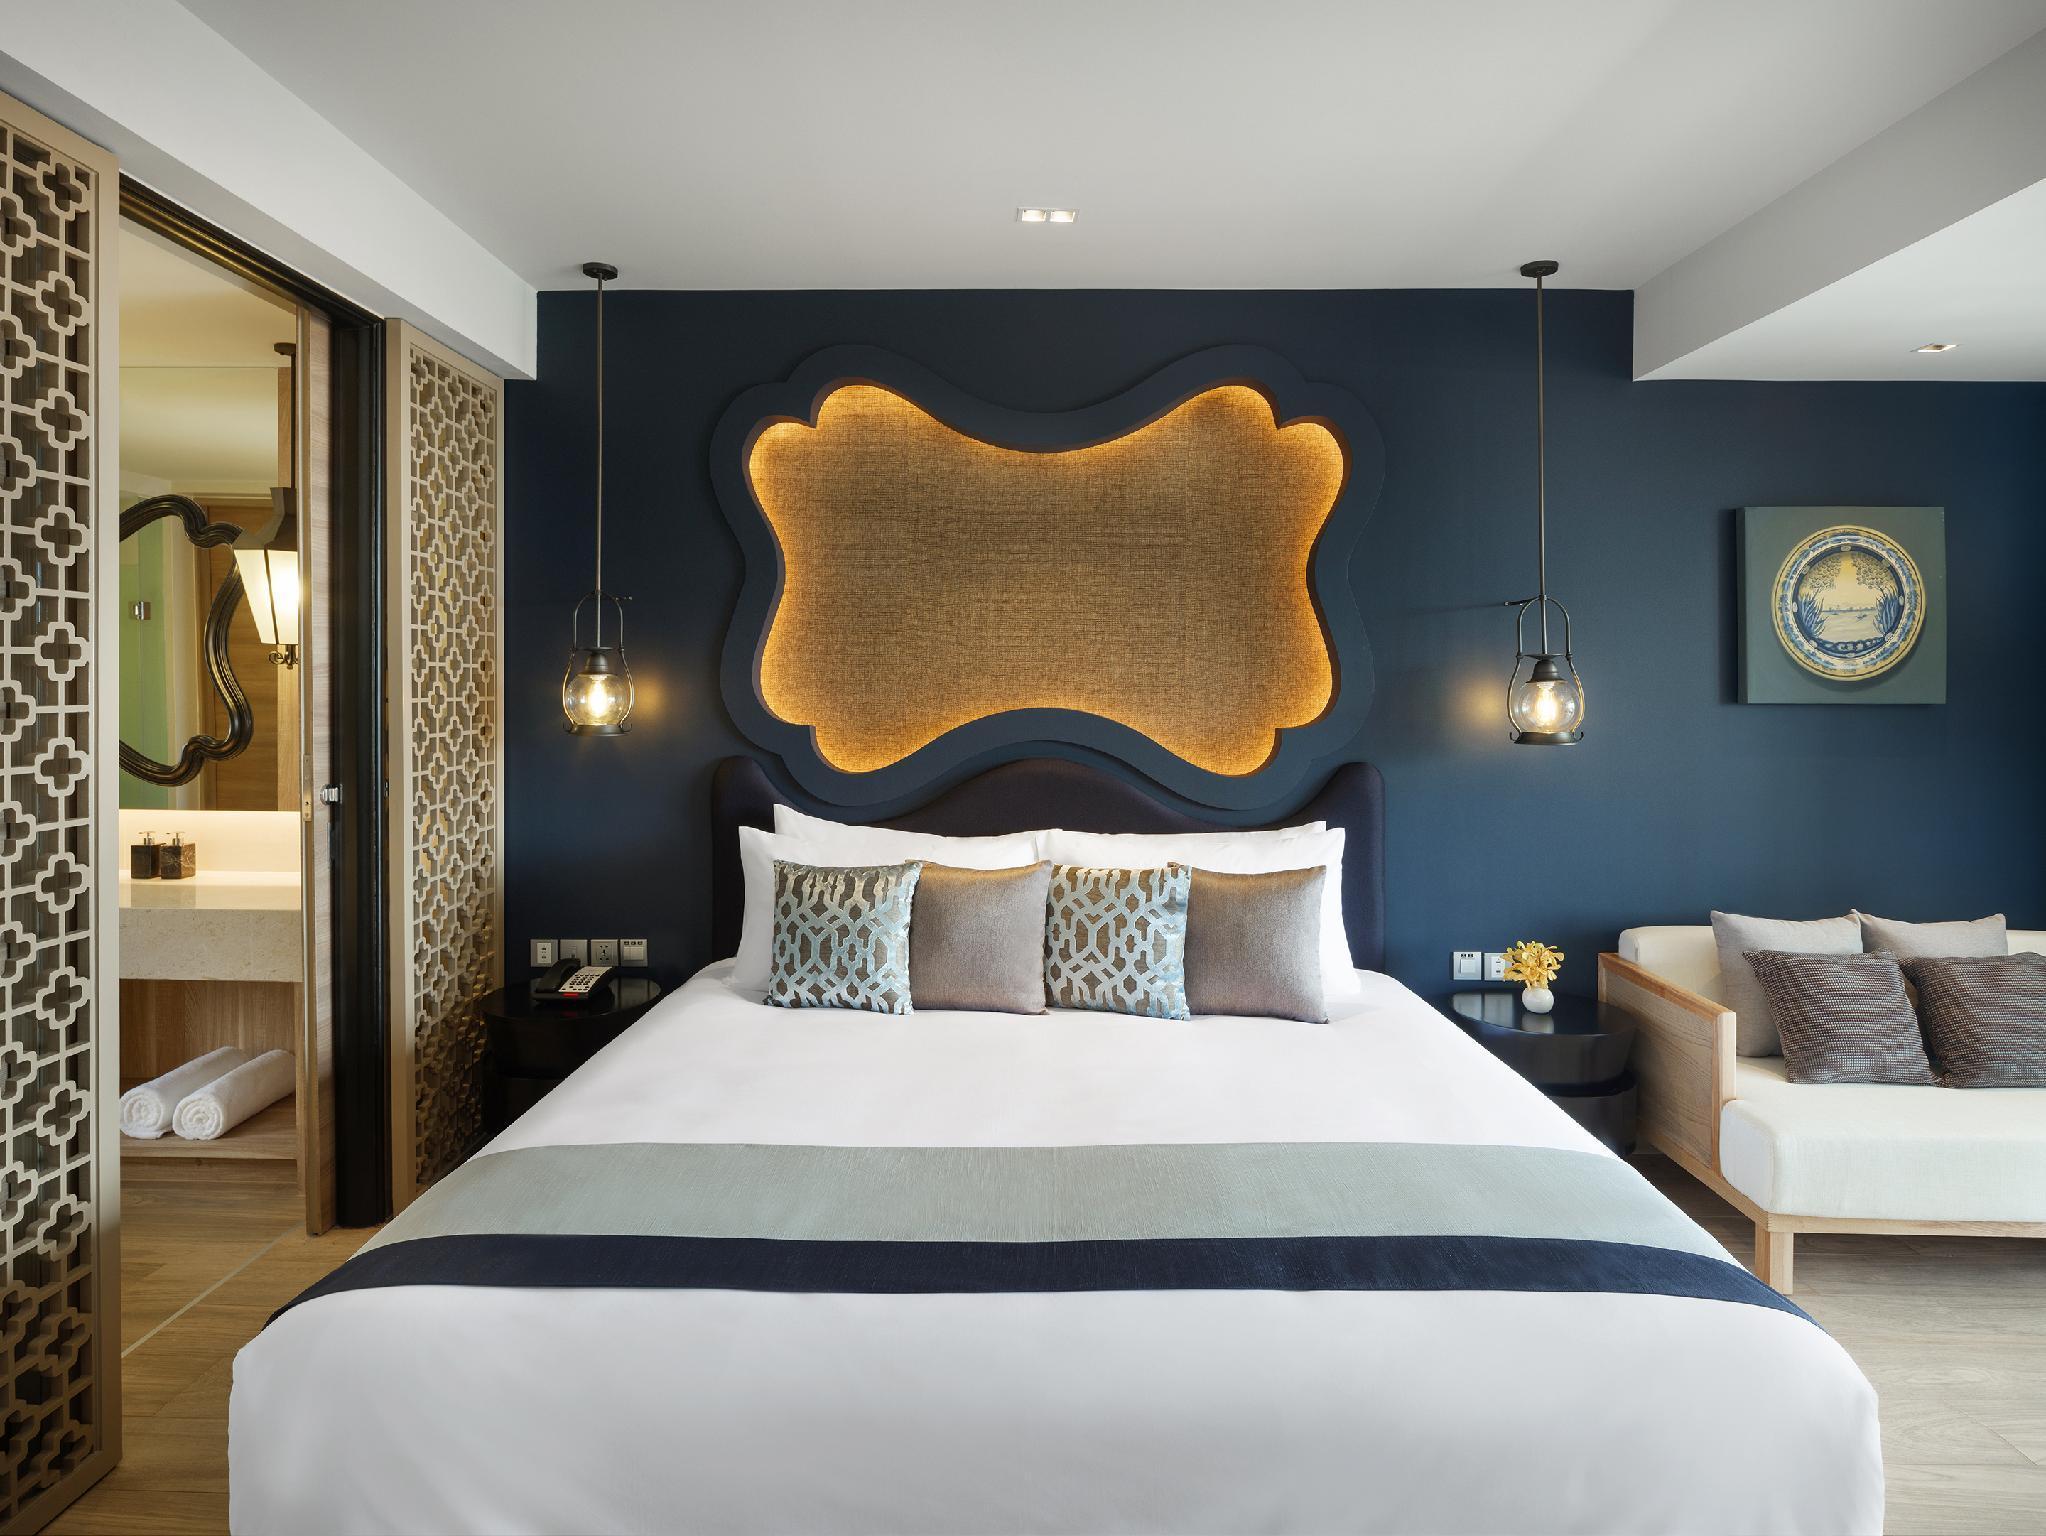 Avista Grande Phuket Karon Mgallery By Sofitel - Phuket Thailand Hotels